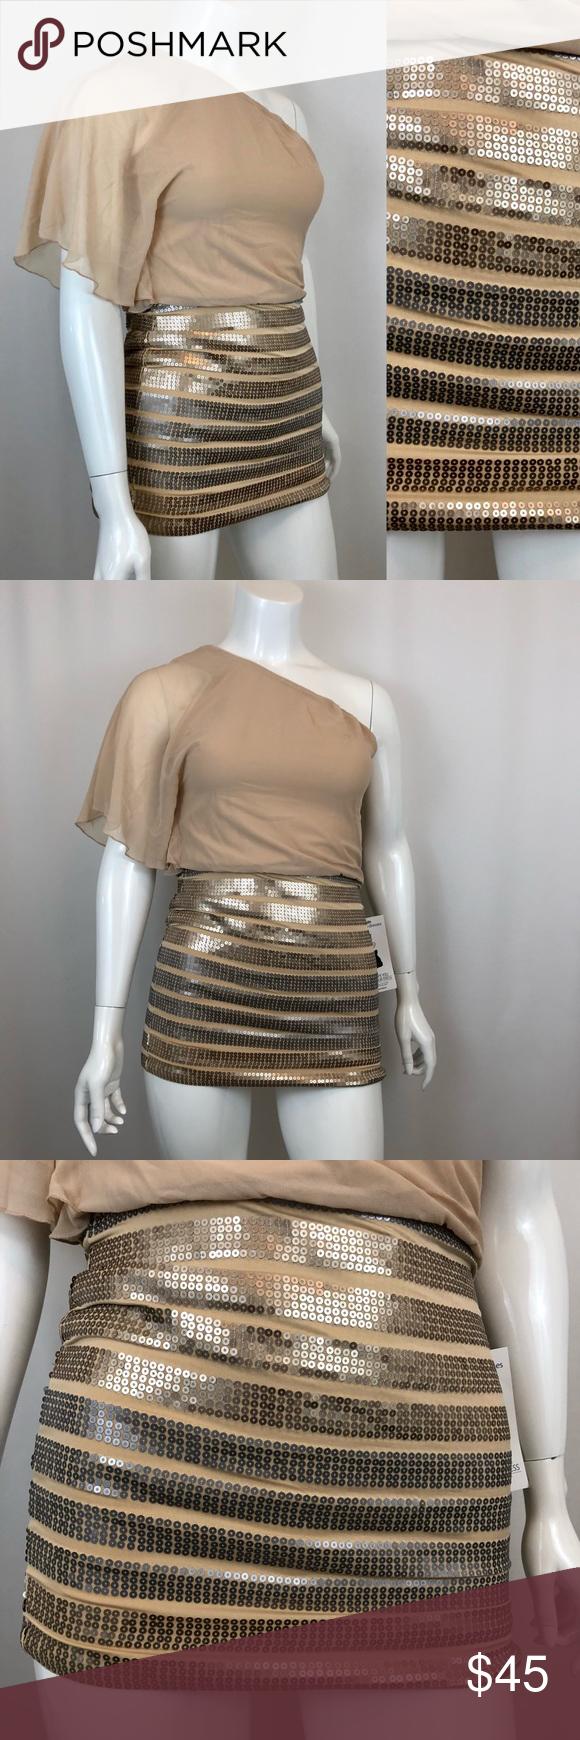 5b5055da2b4 AS U WISH Sequin One Shoulder Dress NWT As U Wish Size  Medium Material   Self  100% Polyester